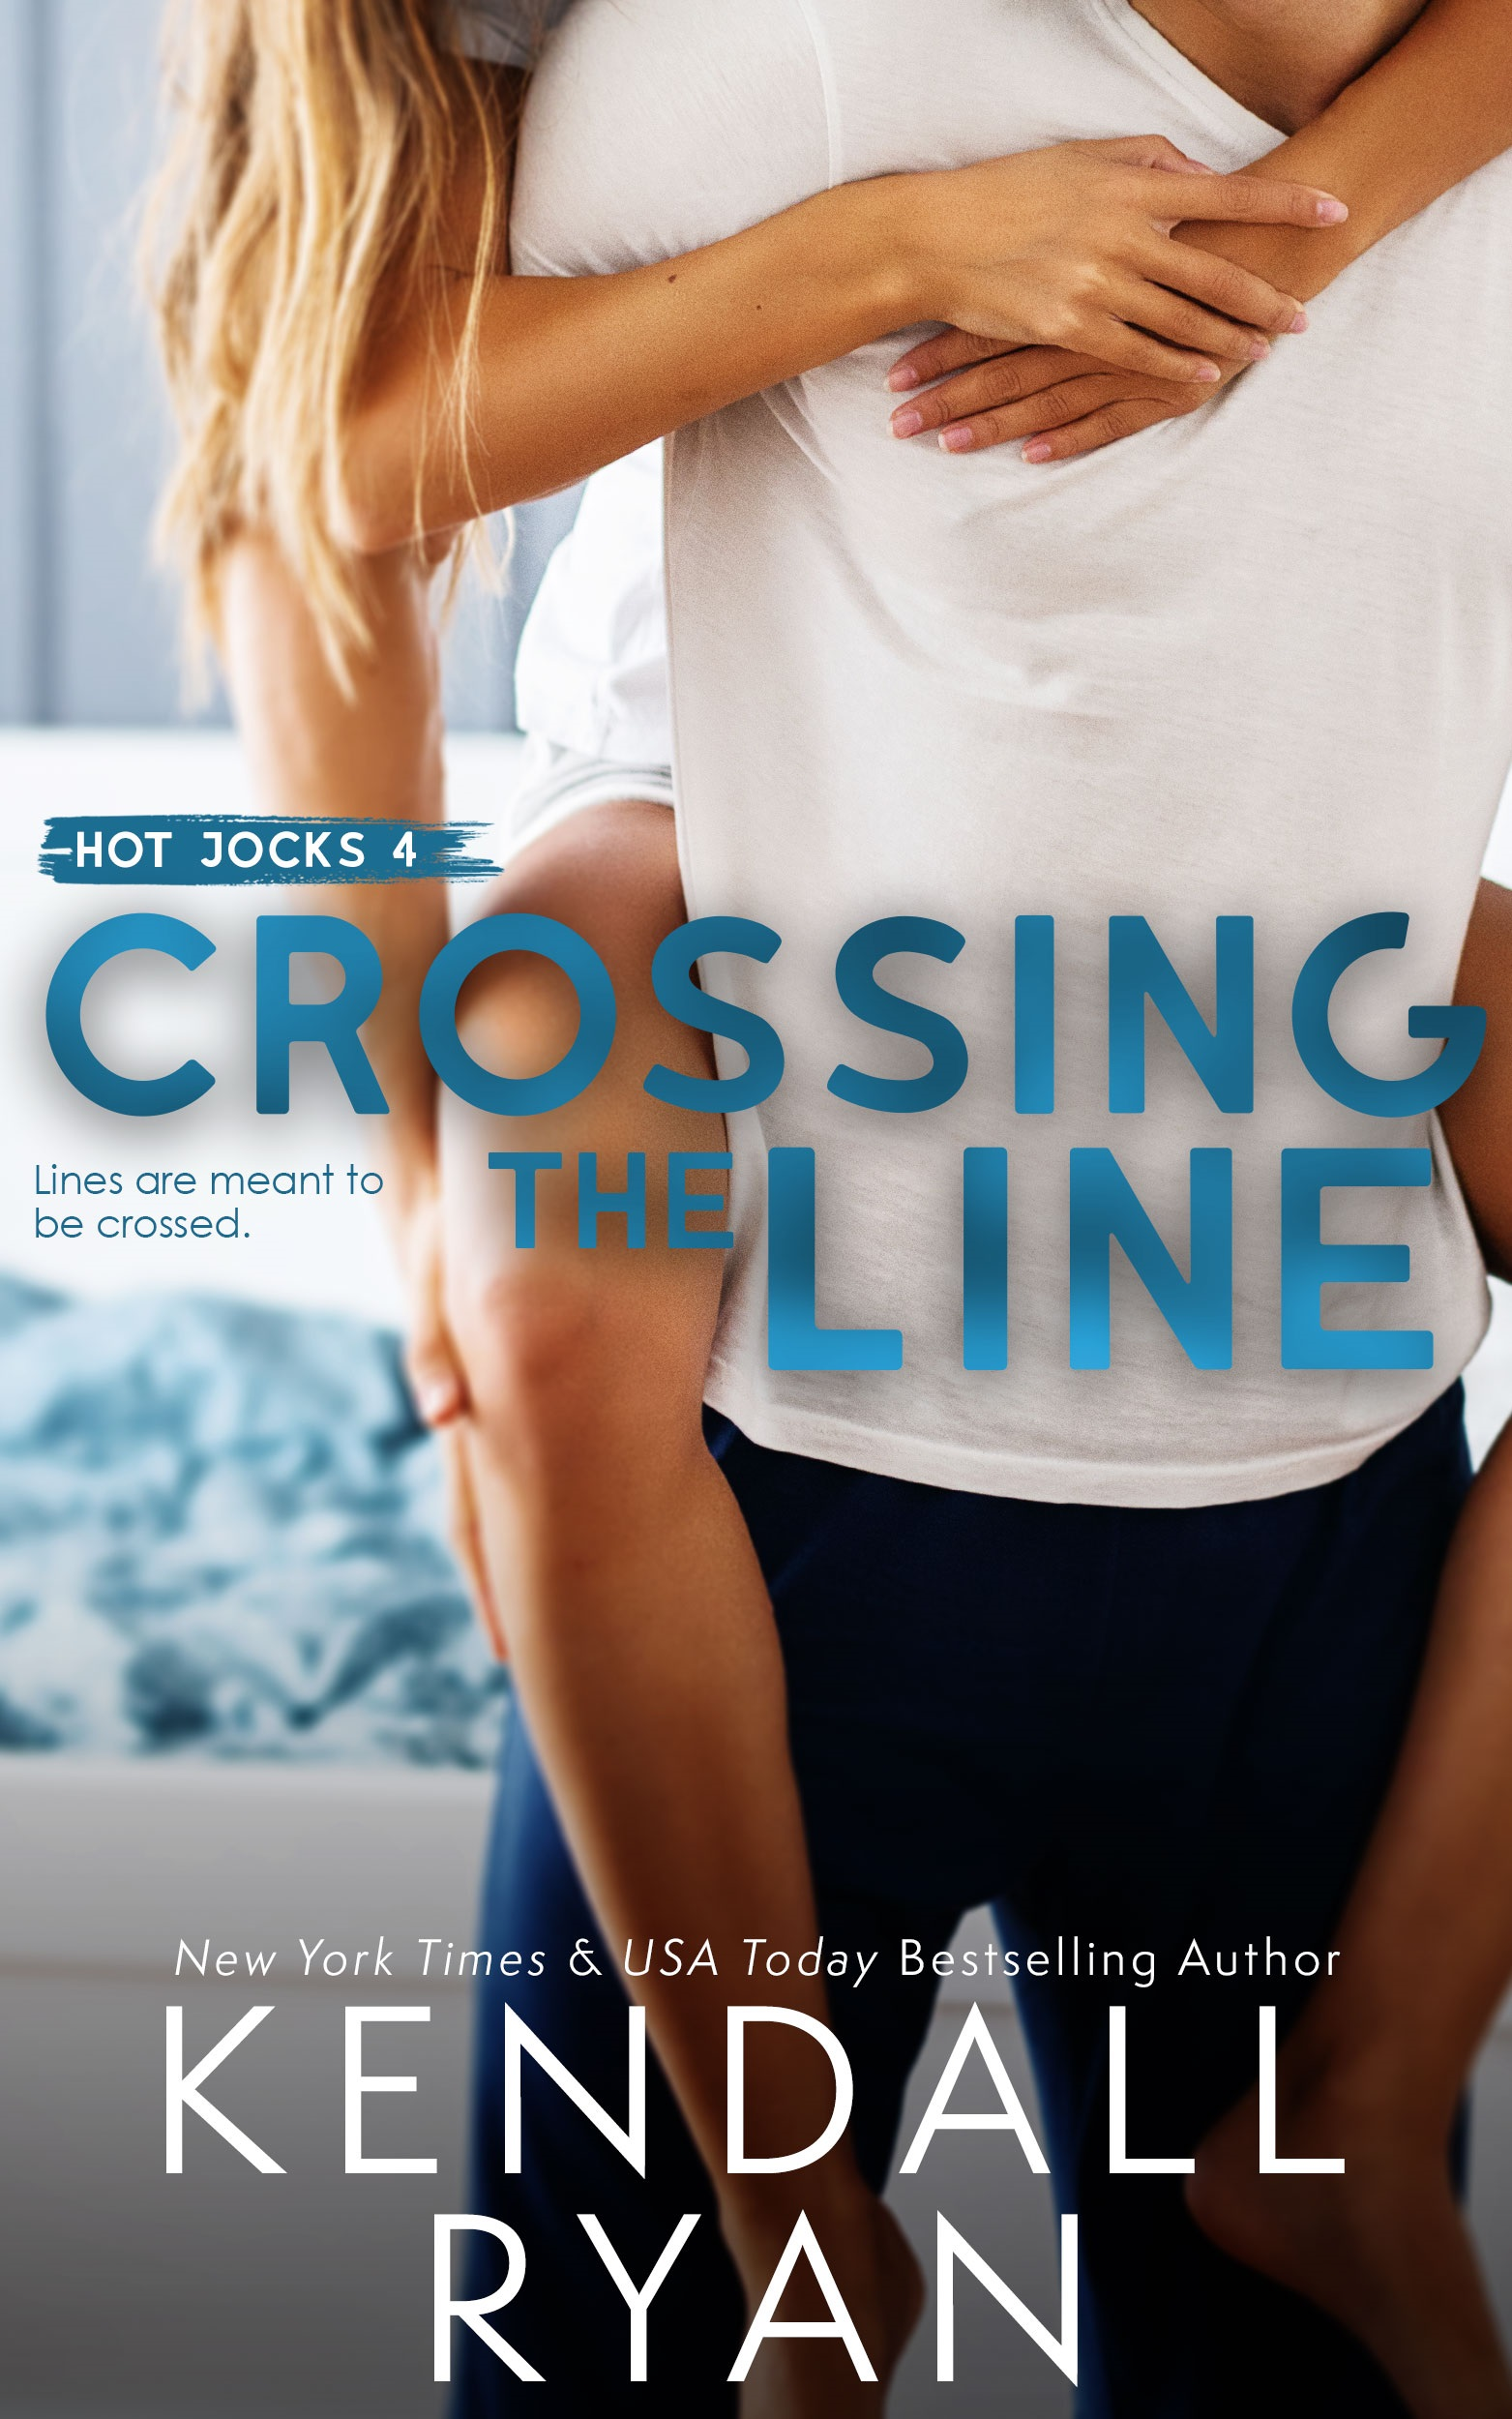 Crossing the Line (Hot Jocks, #4)